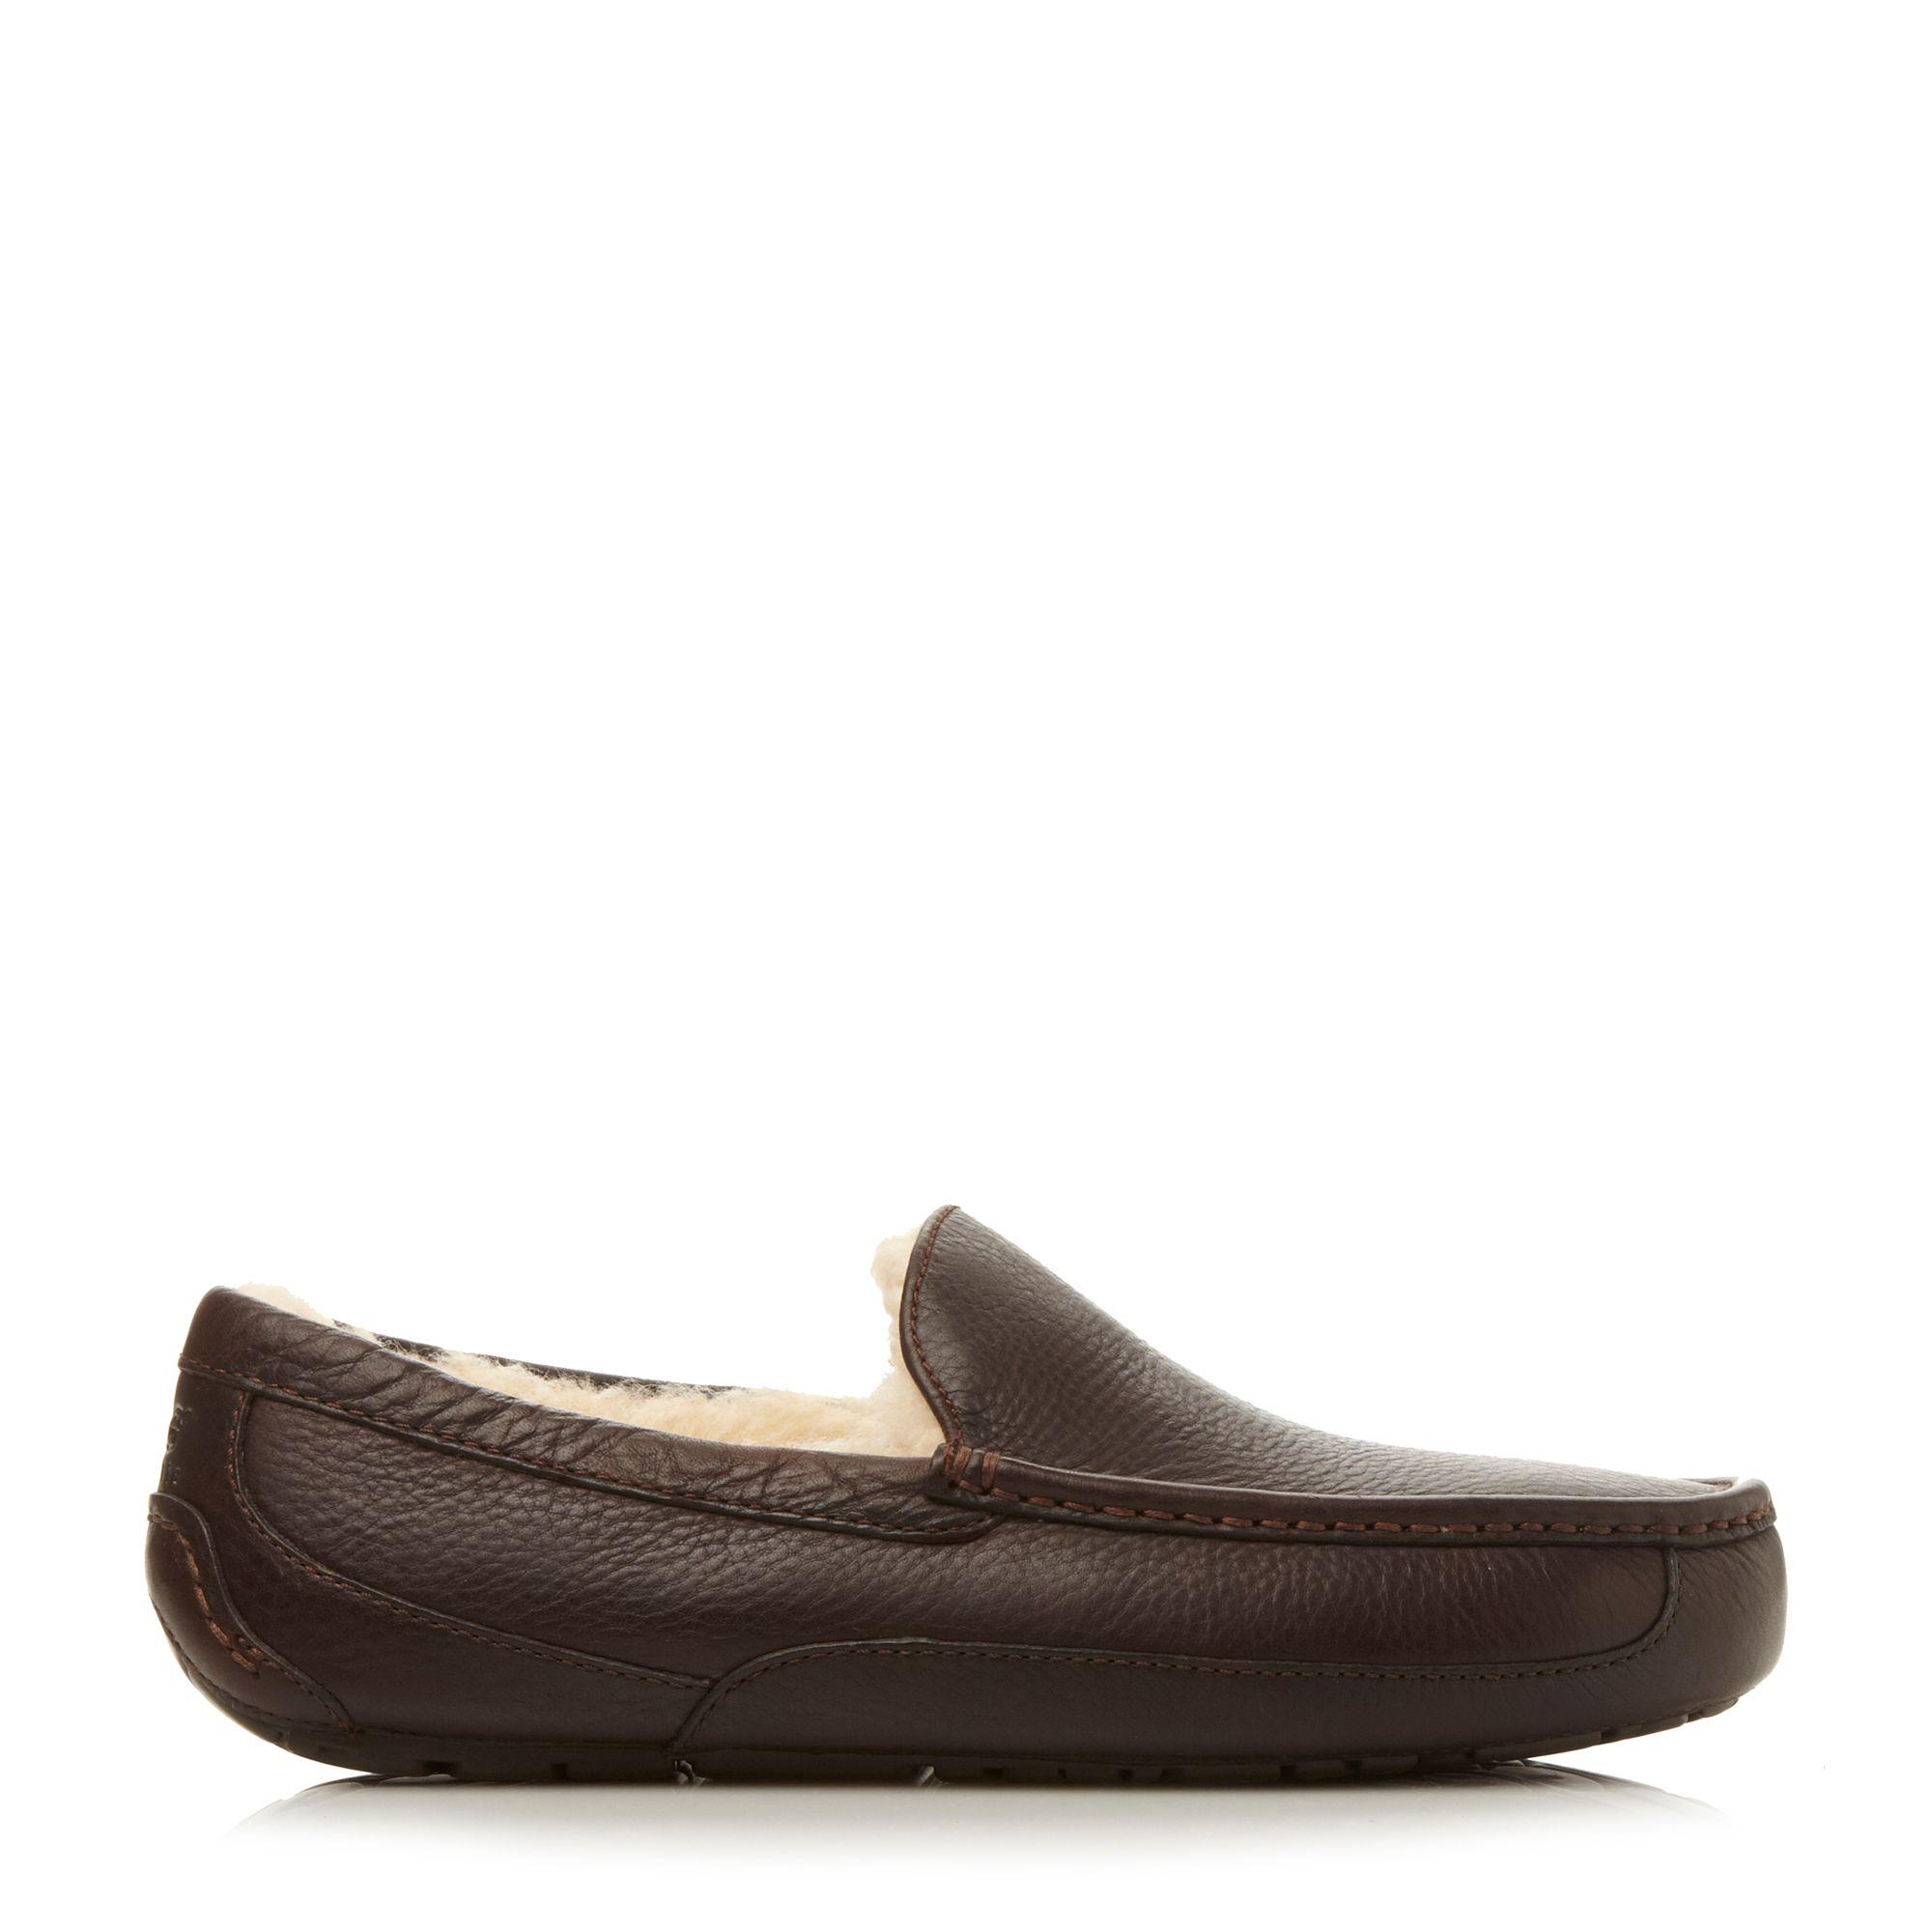 Clarks Shoes Ascot